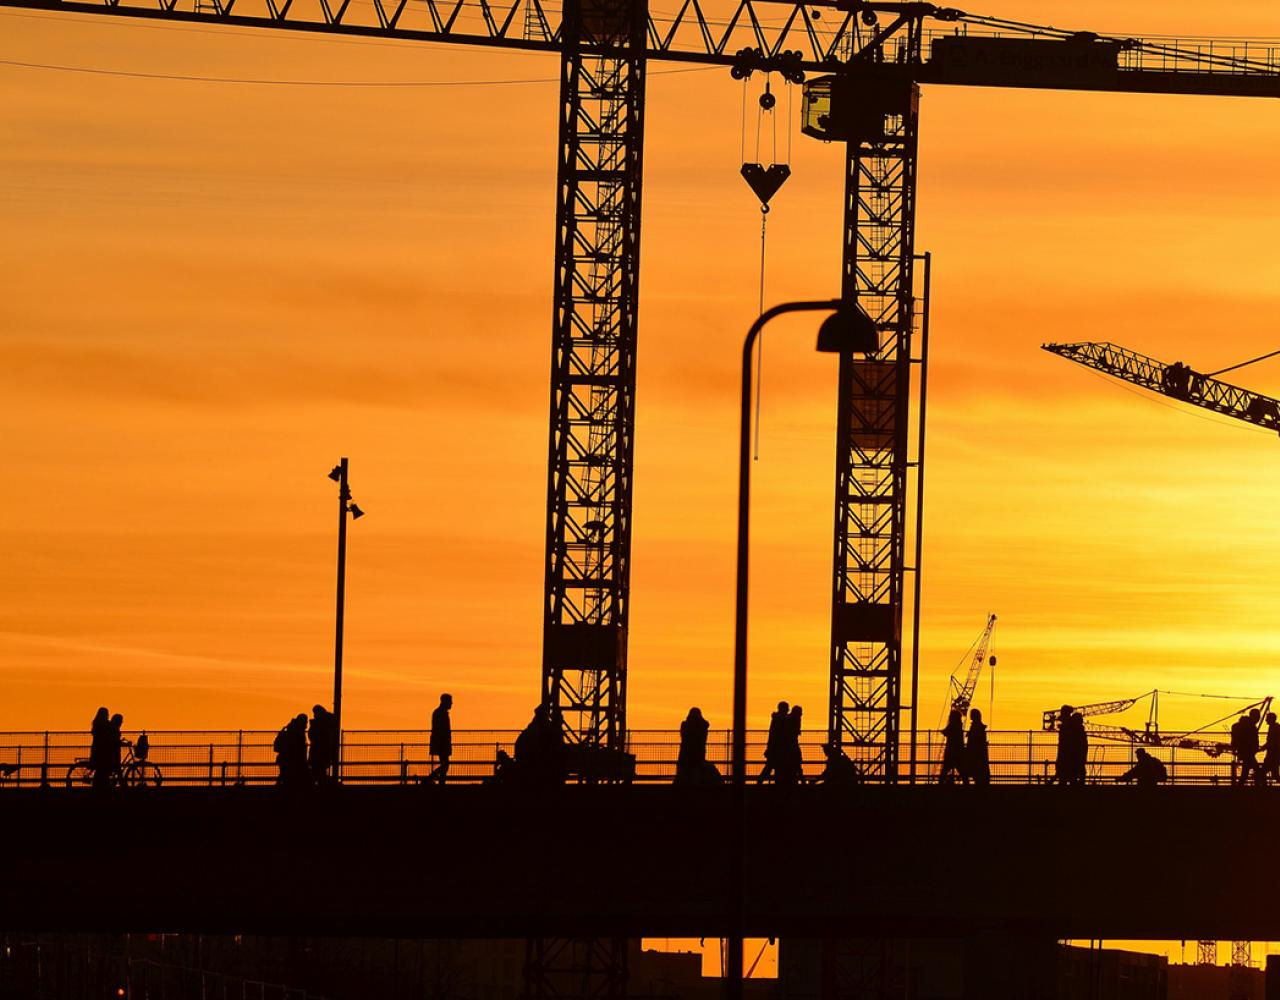 dybbølsbro byggekraner